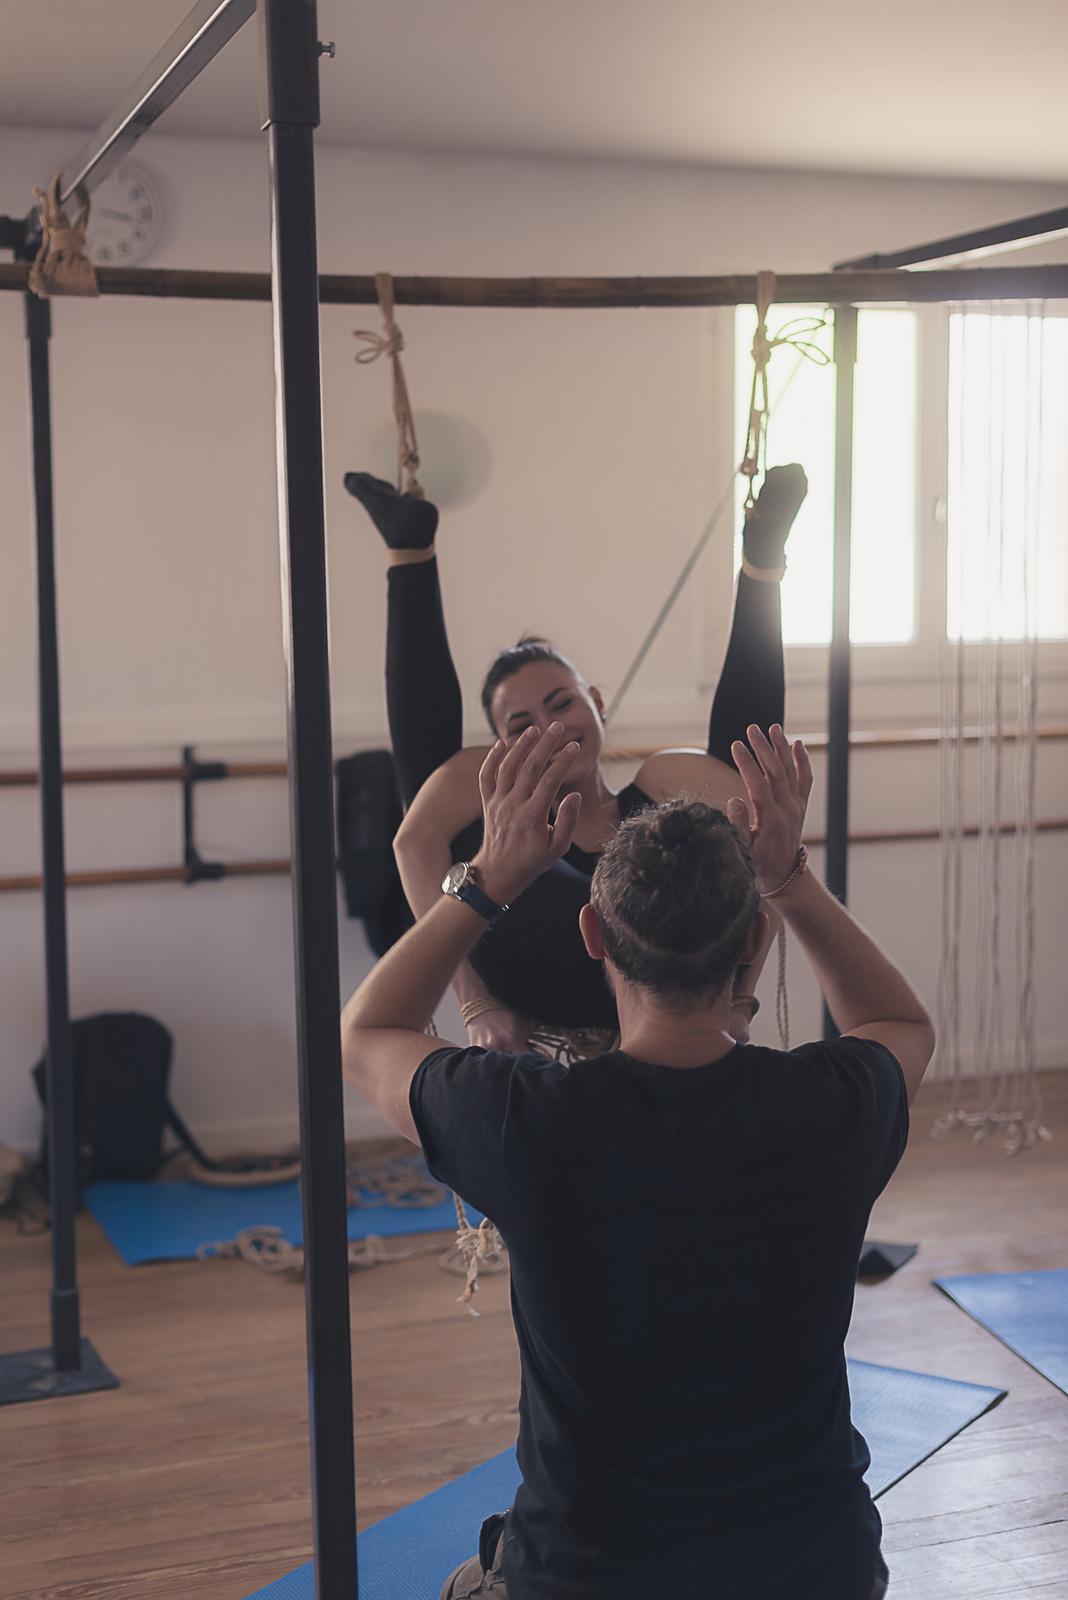 Workshop at Ecole des Cordes. Montpellier, France. Model: Denjamy Djovanny. Shibari by Mosafir. Photo: Alex DirtyVonP